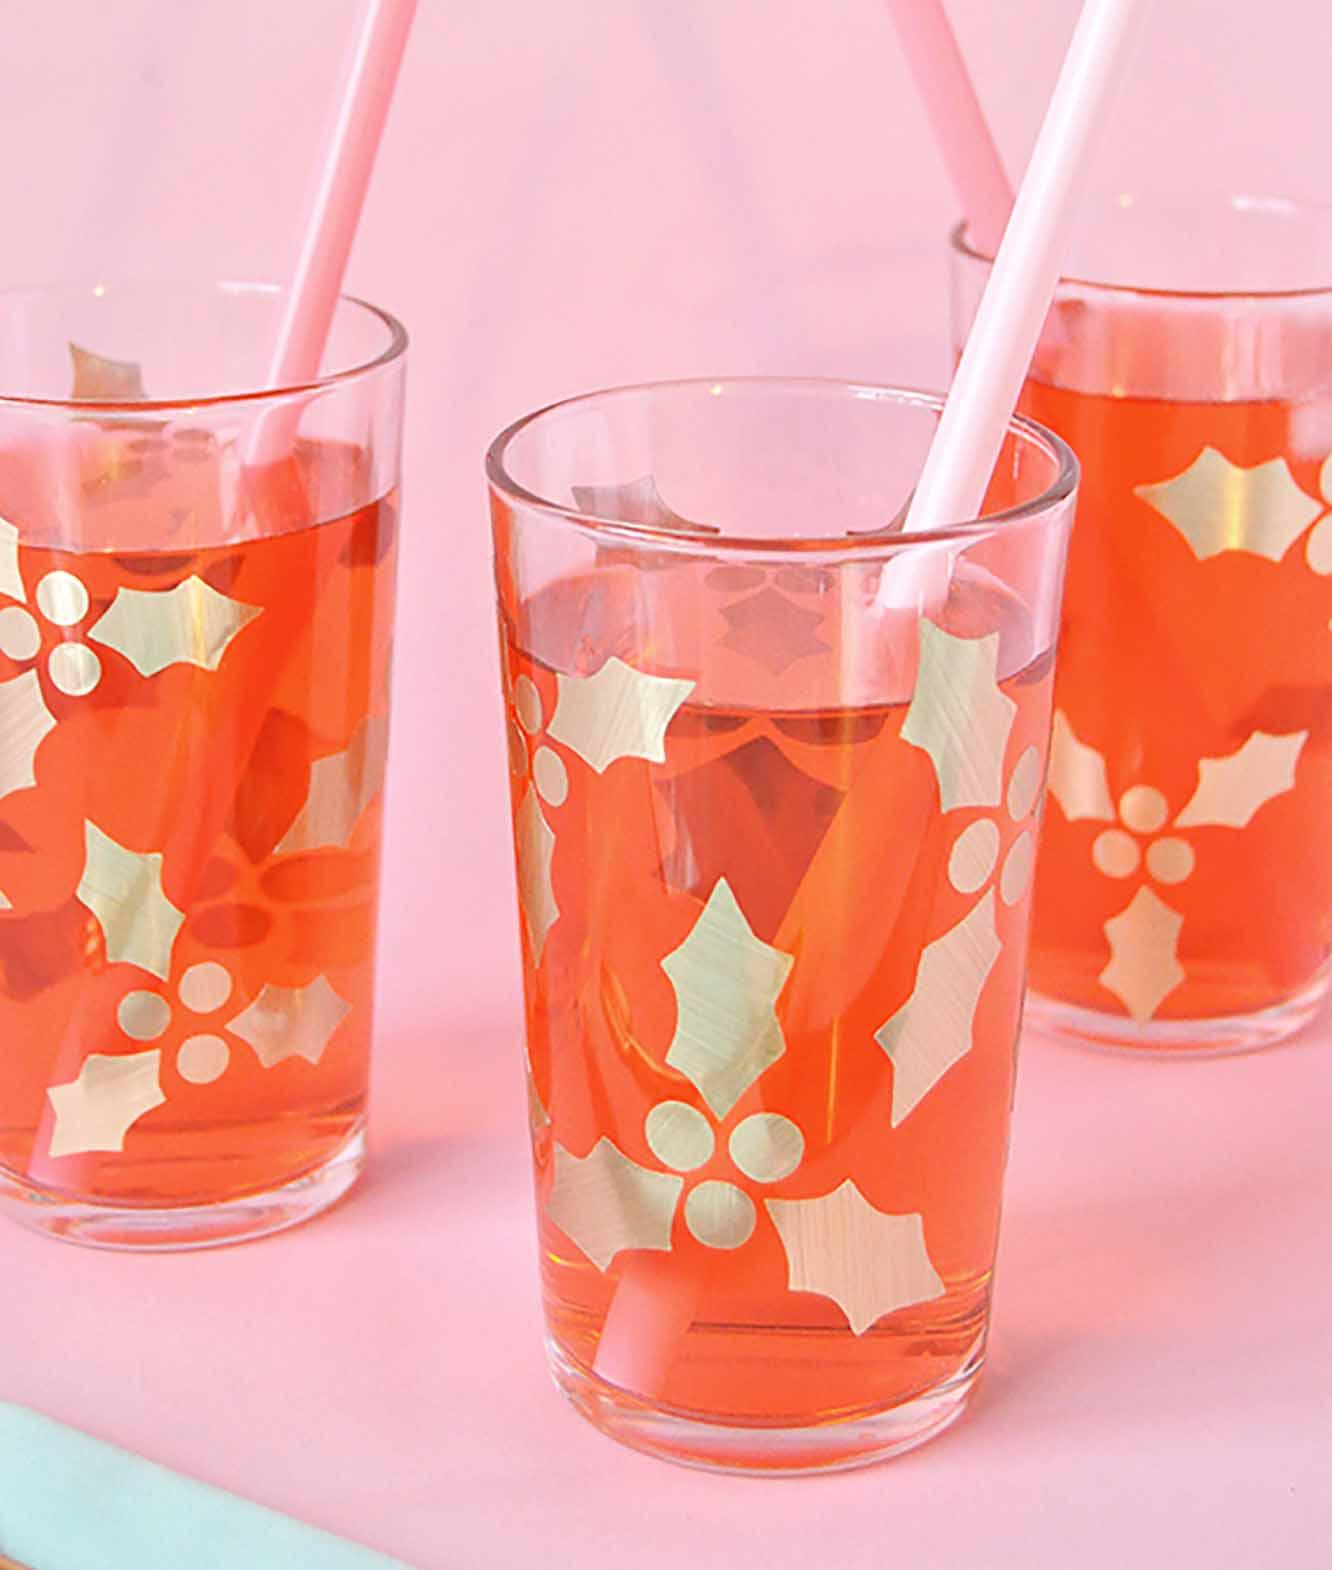 Golden Holly Drinking Glasses